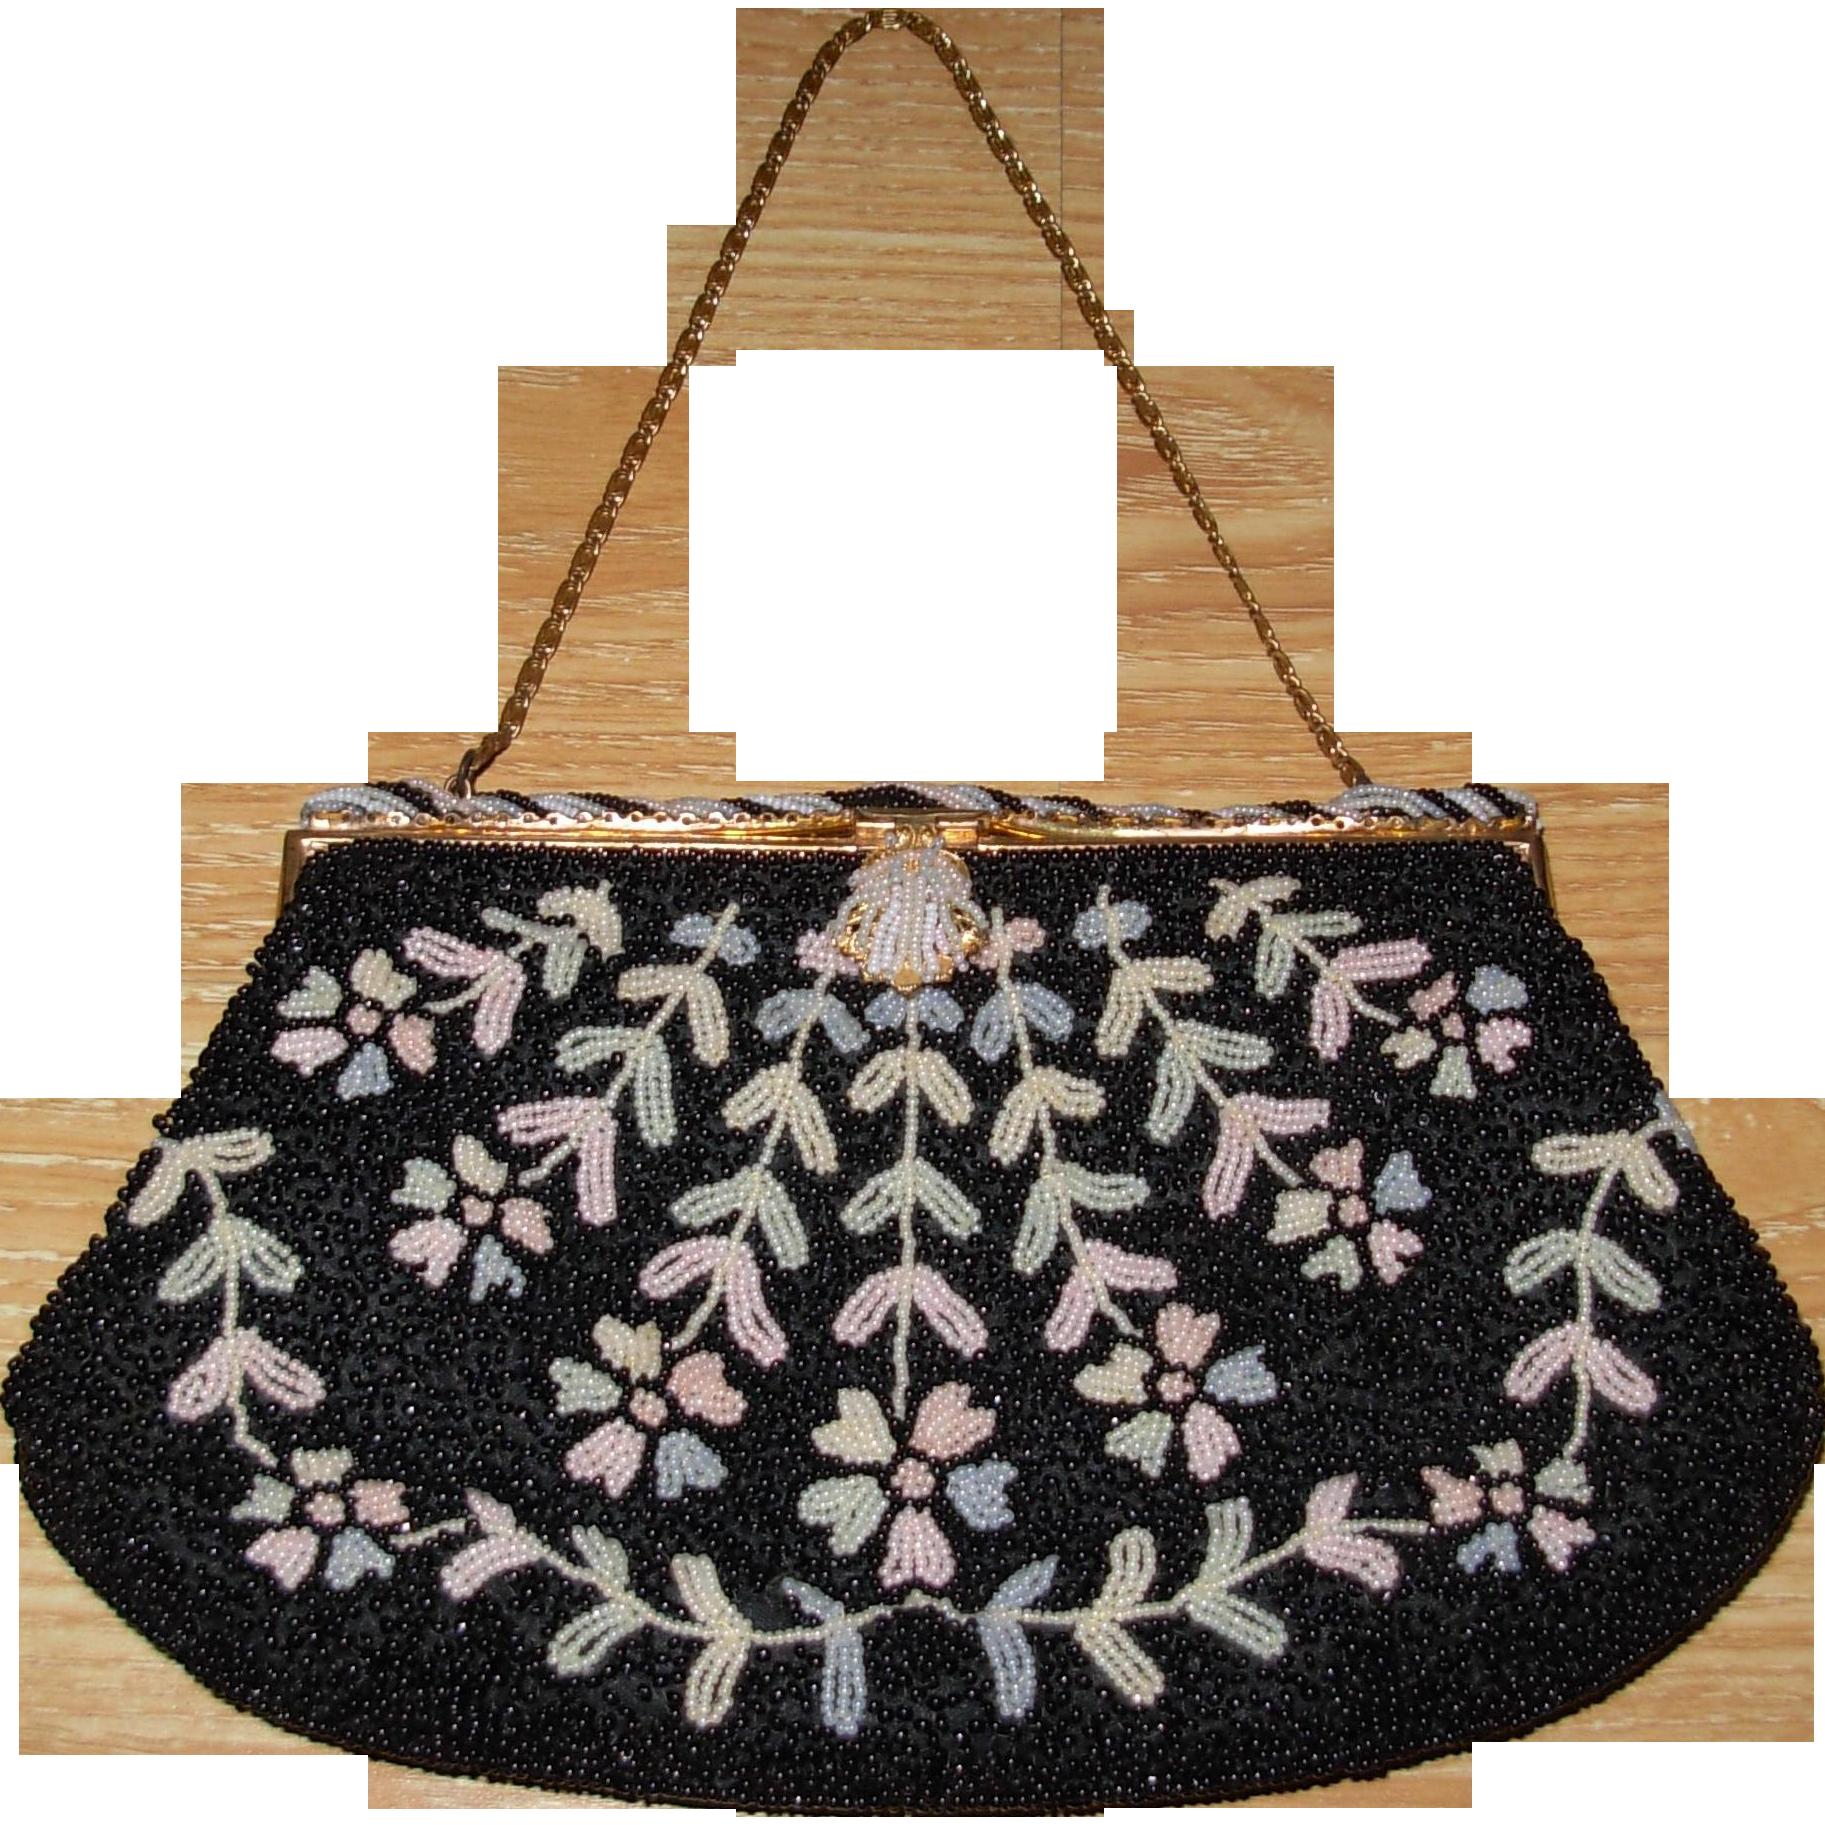 Vintage French Hand Beaded Walborg Handbag Purse